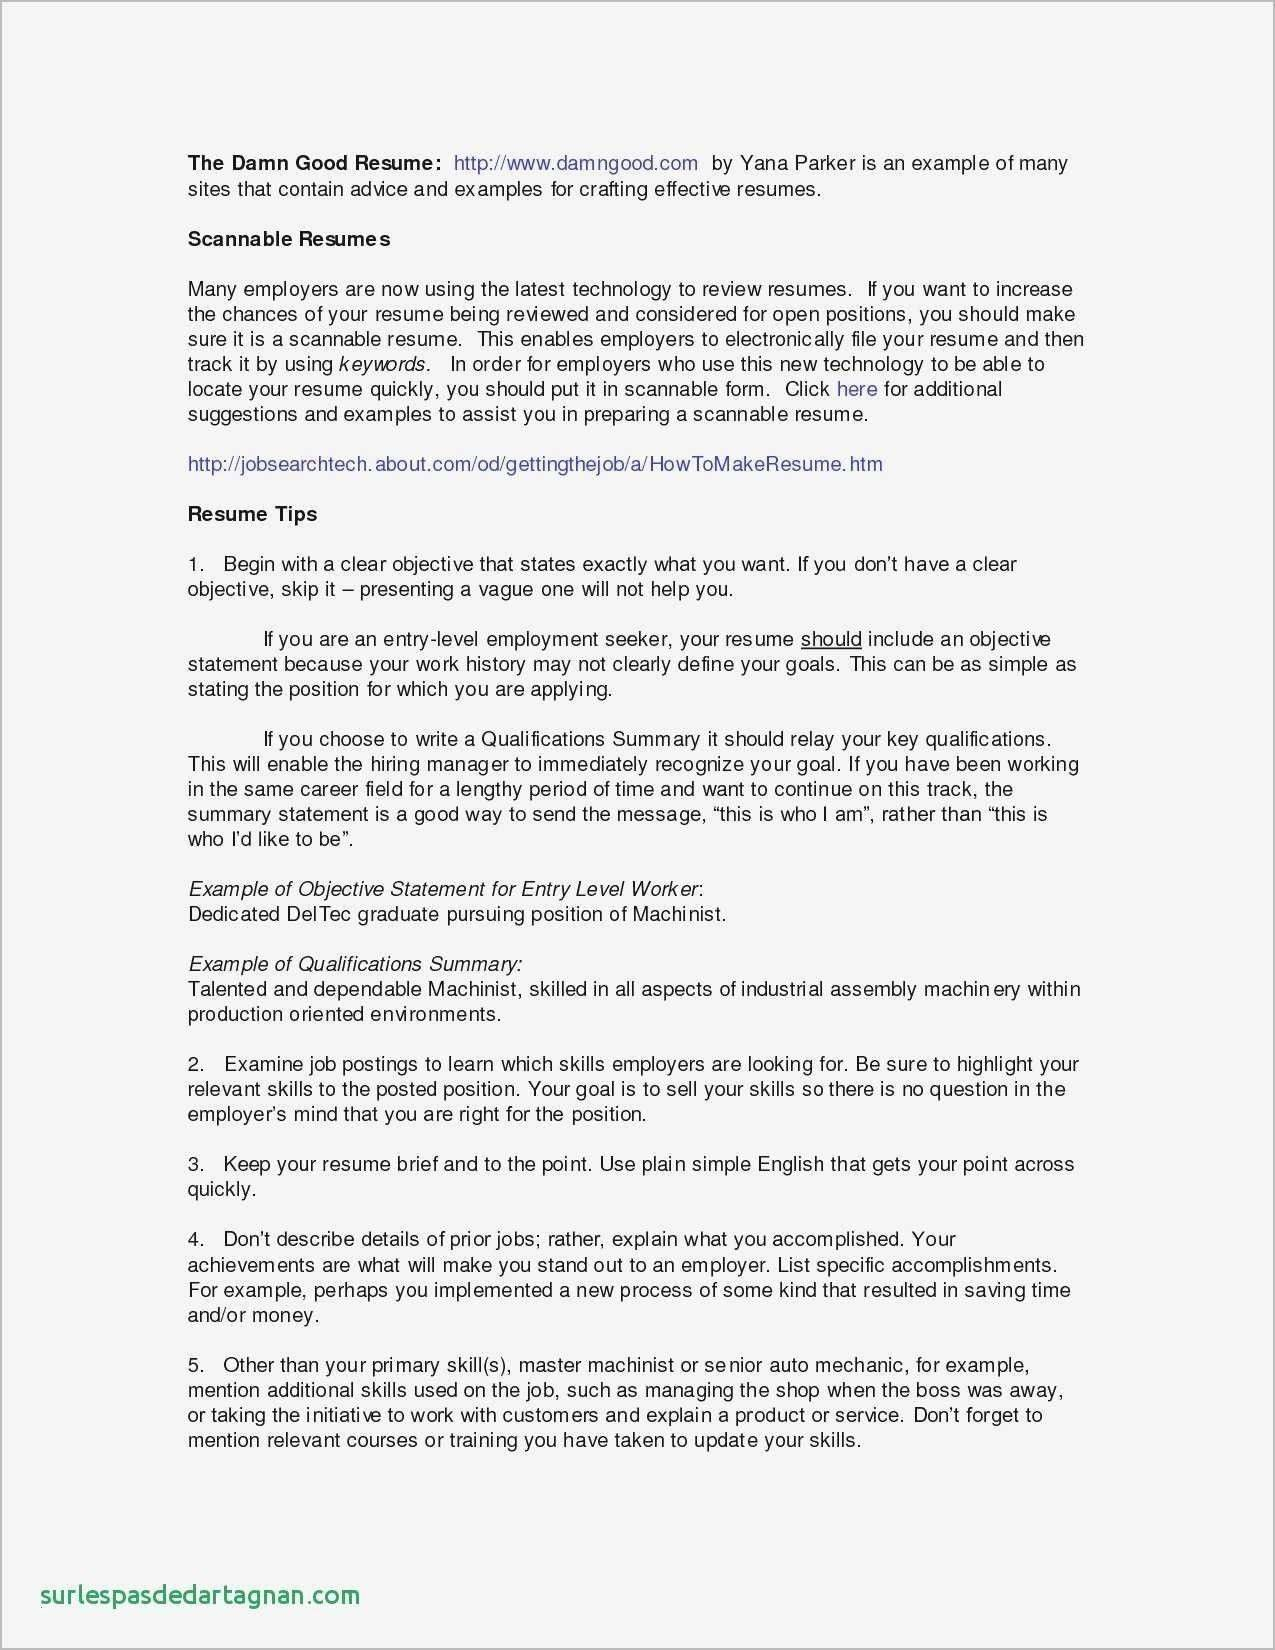 Publicity Release Form Template